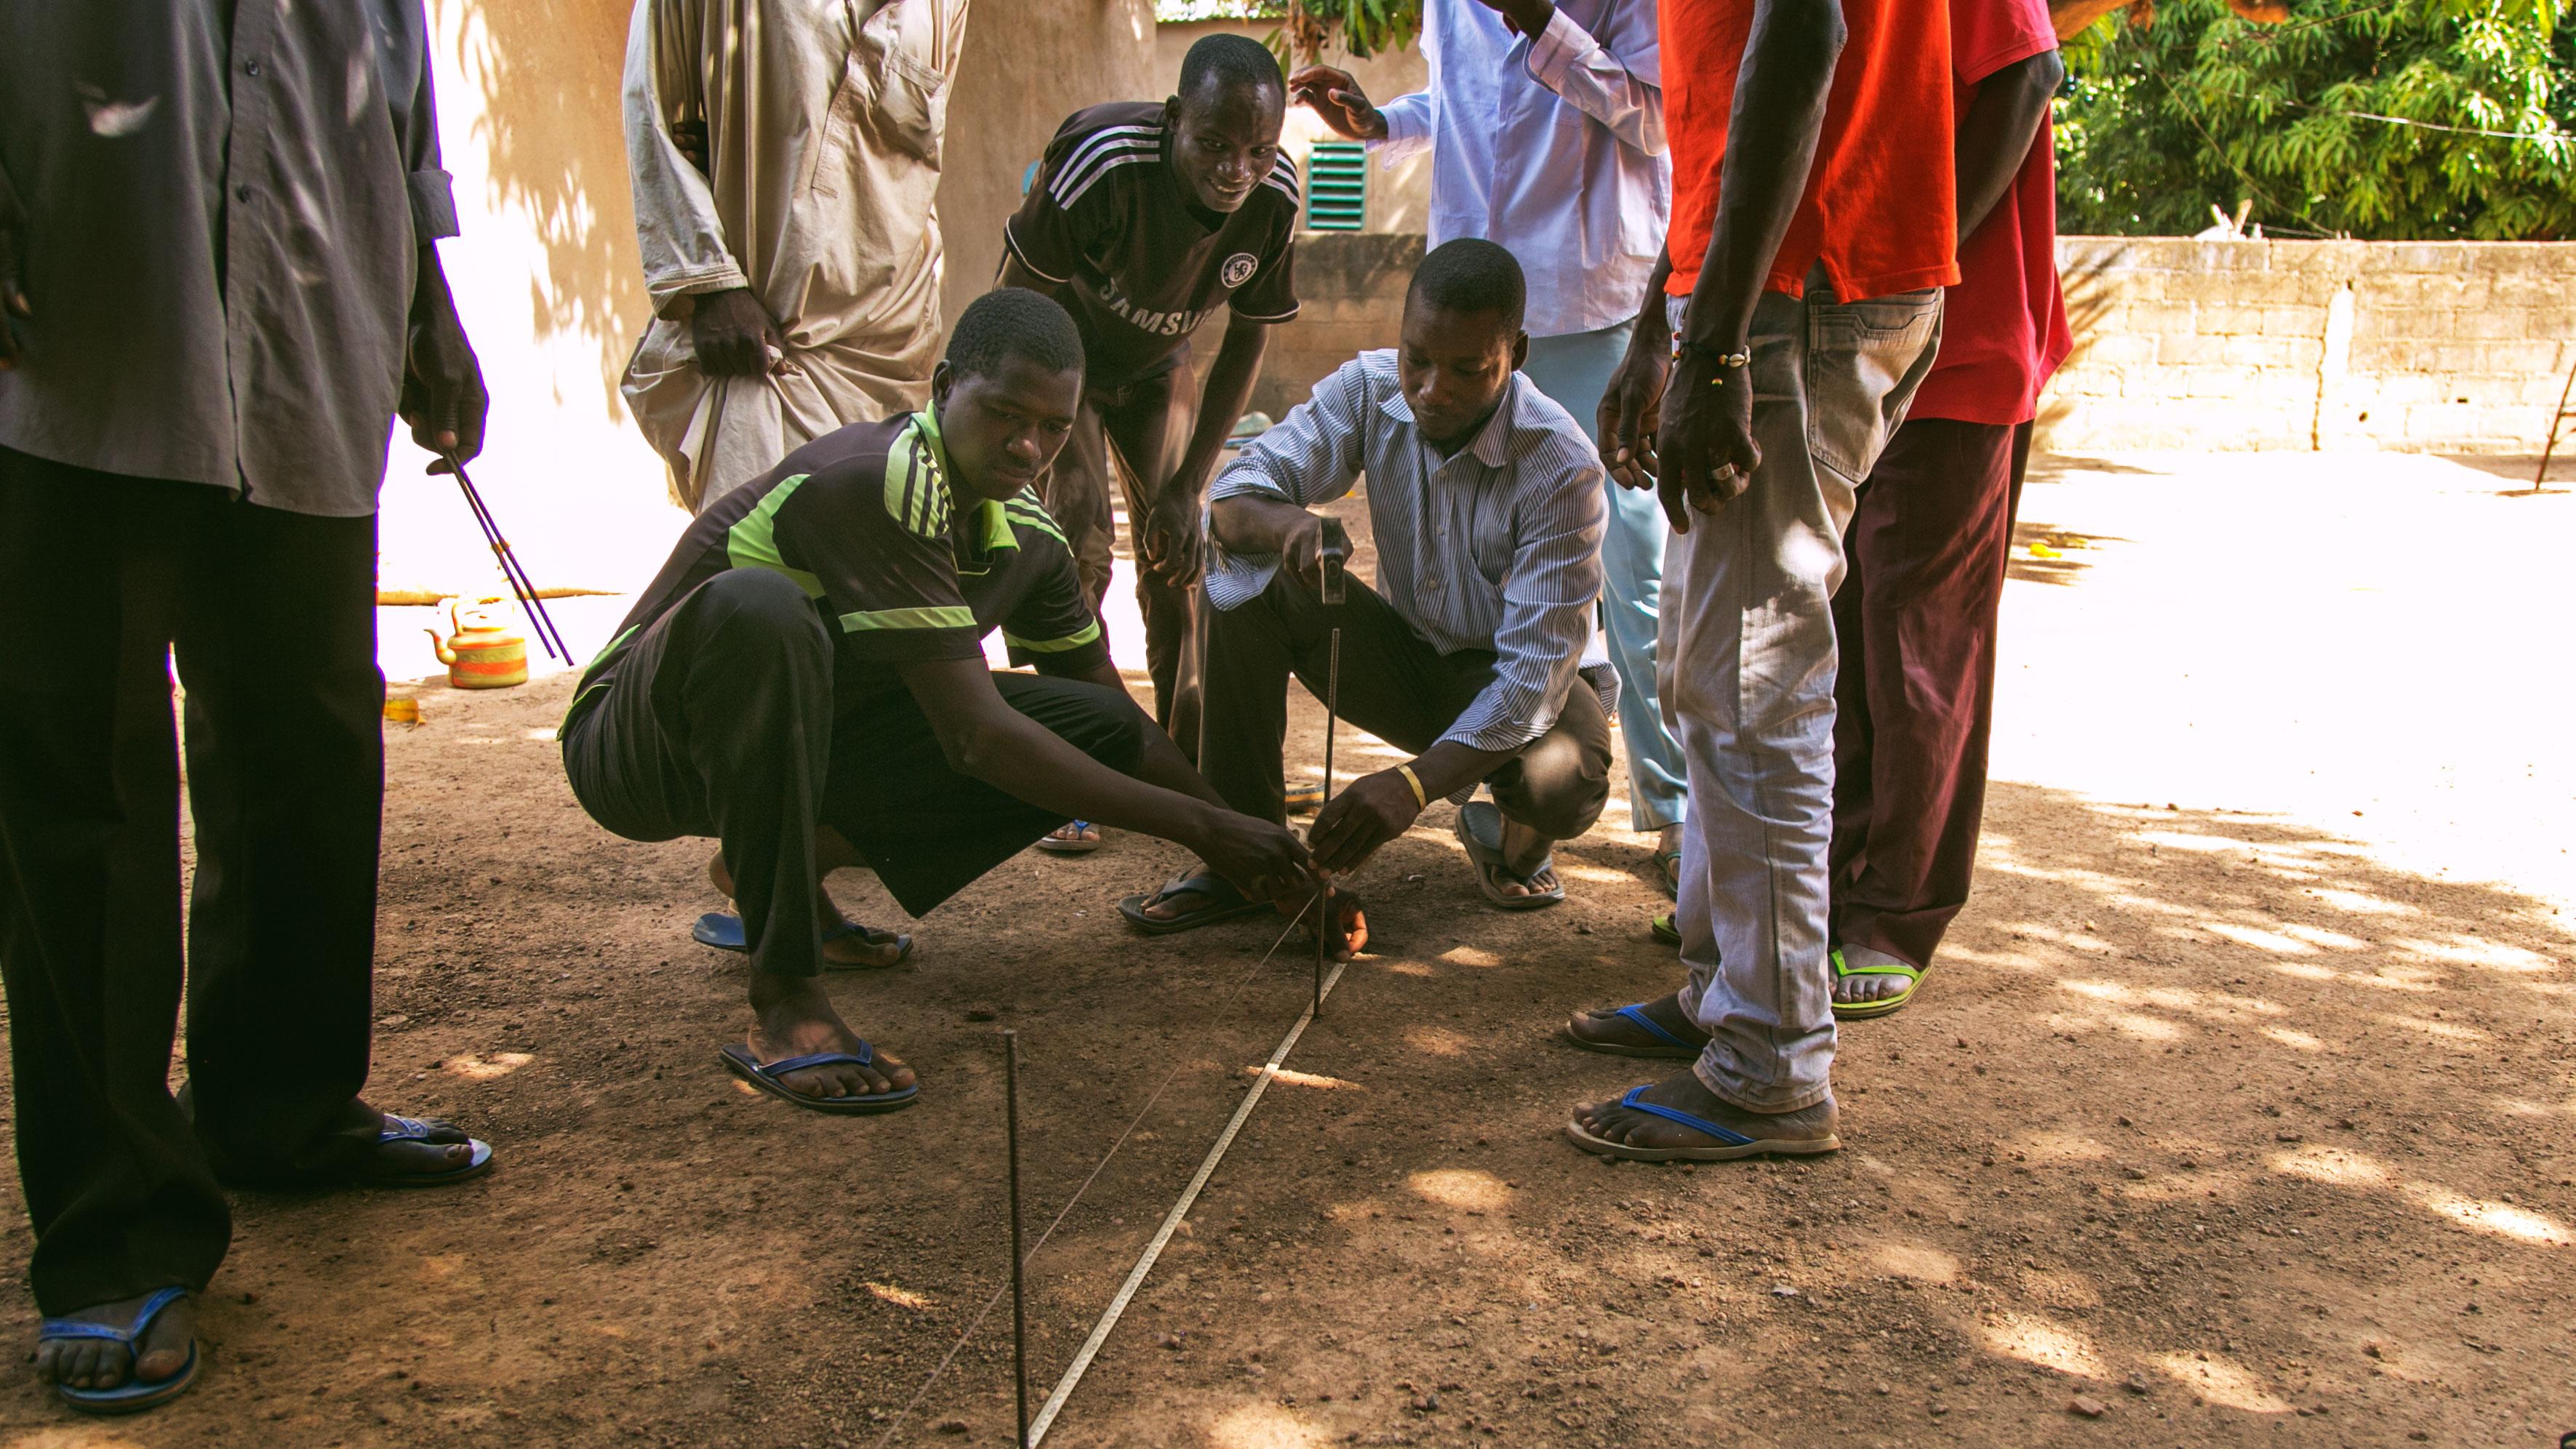 Construction_work_Earth_Roofs_in_the_Sahel_Program.jpg